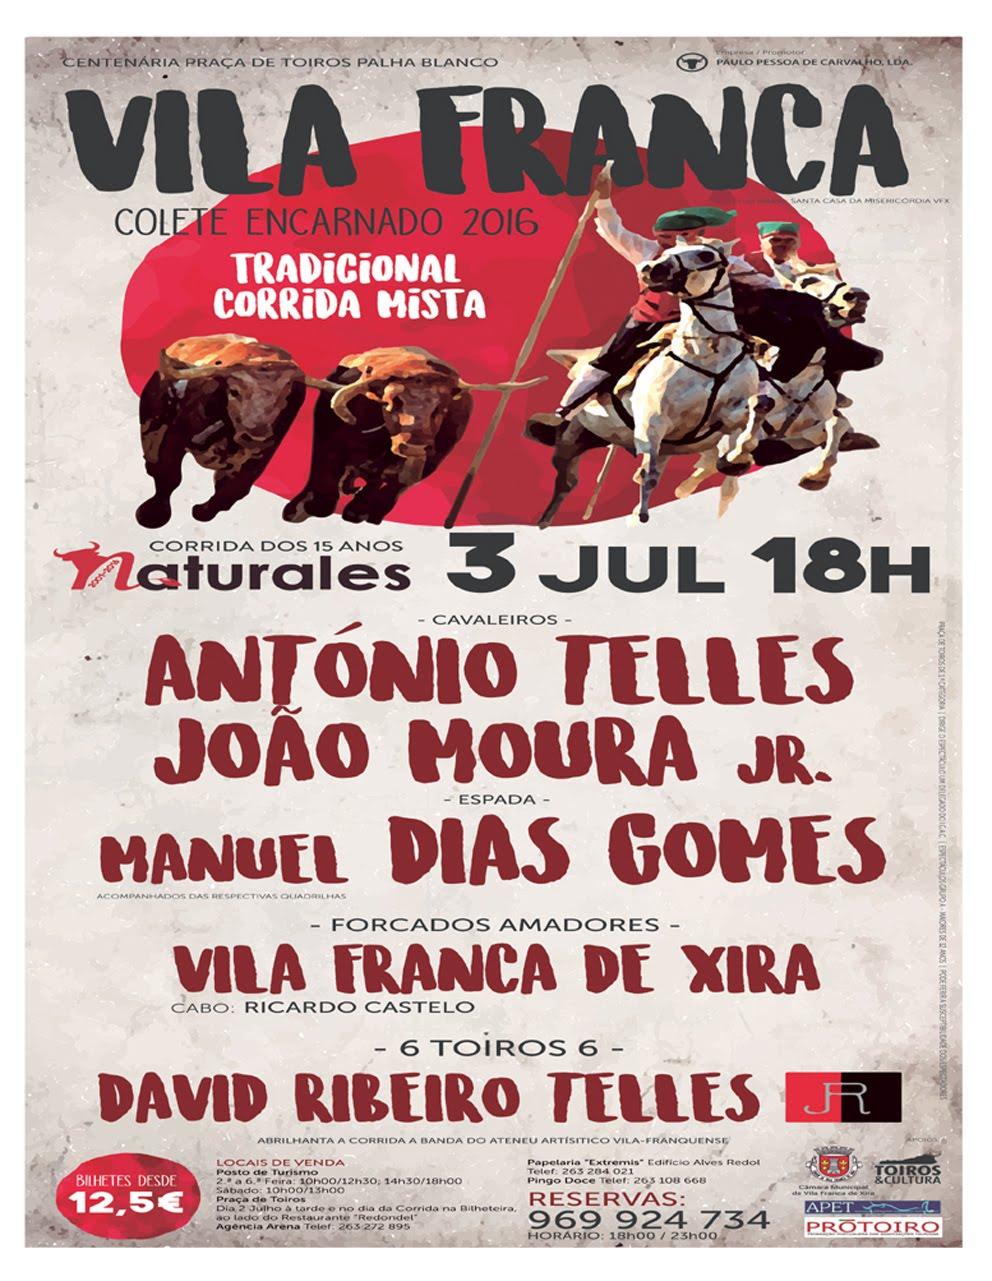 Vila Franca - 3 JUL . 18 H